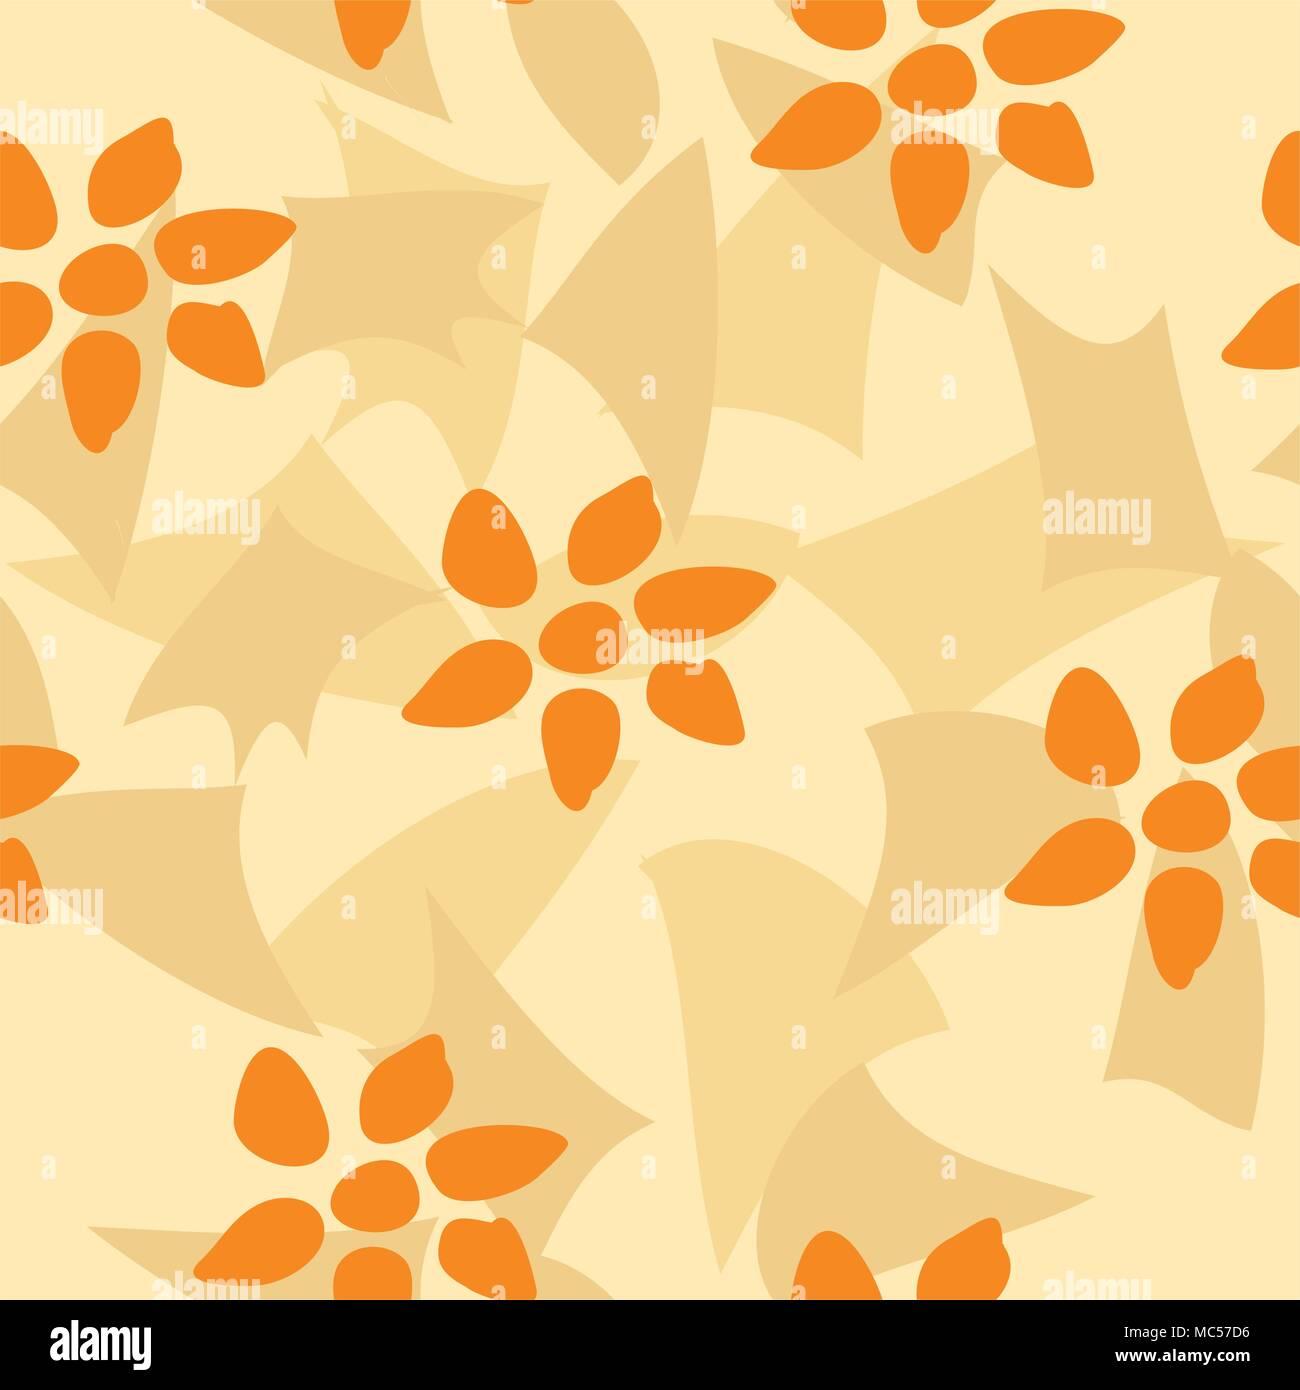 Seamless Tile Vector Texture Pattern Orange Flower Wallpaper